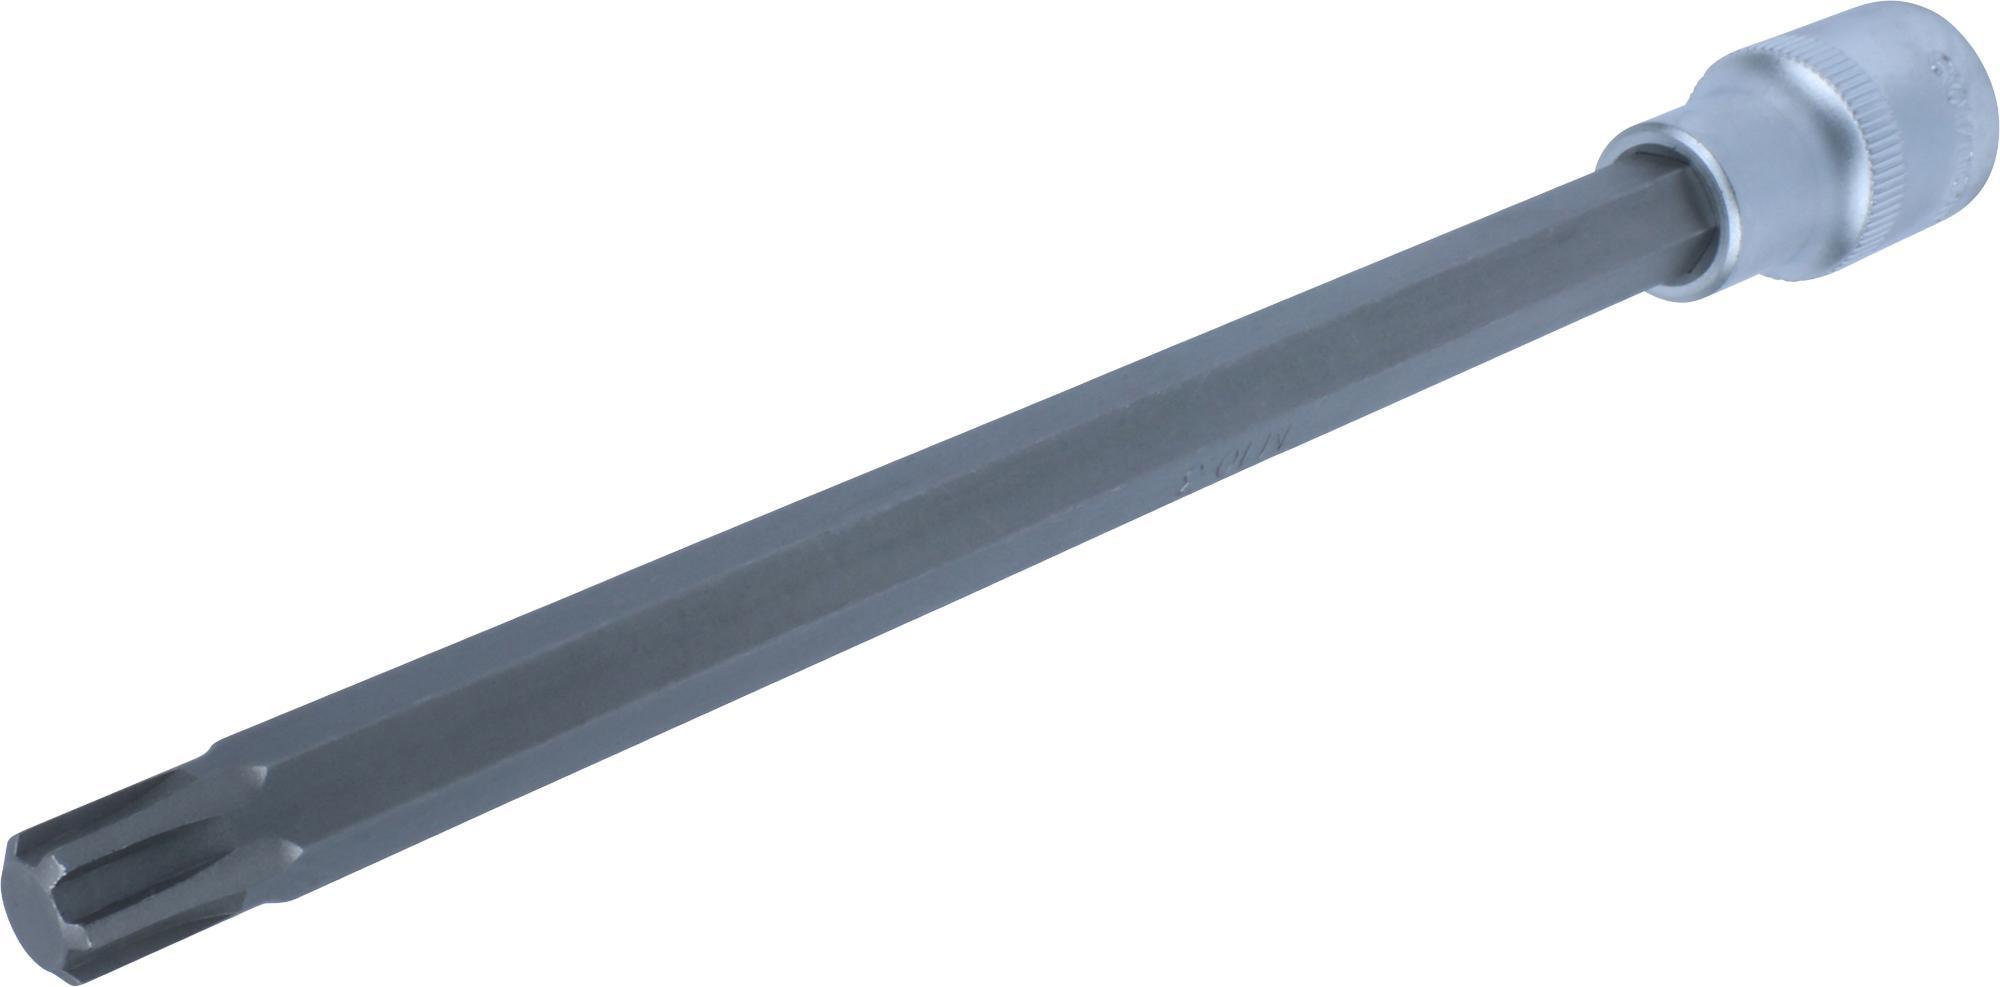 "Nástavec, 1/2"", Keilnut M10.3x200 mm"